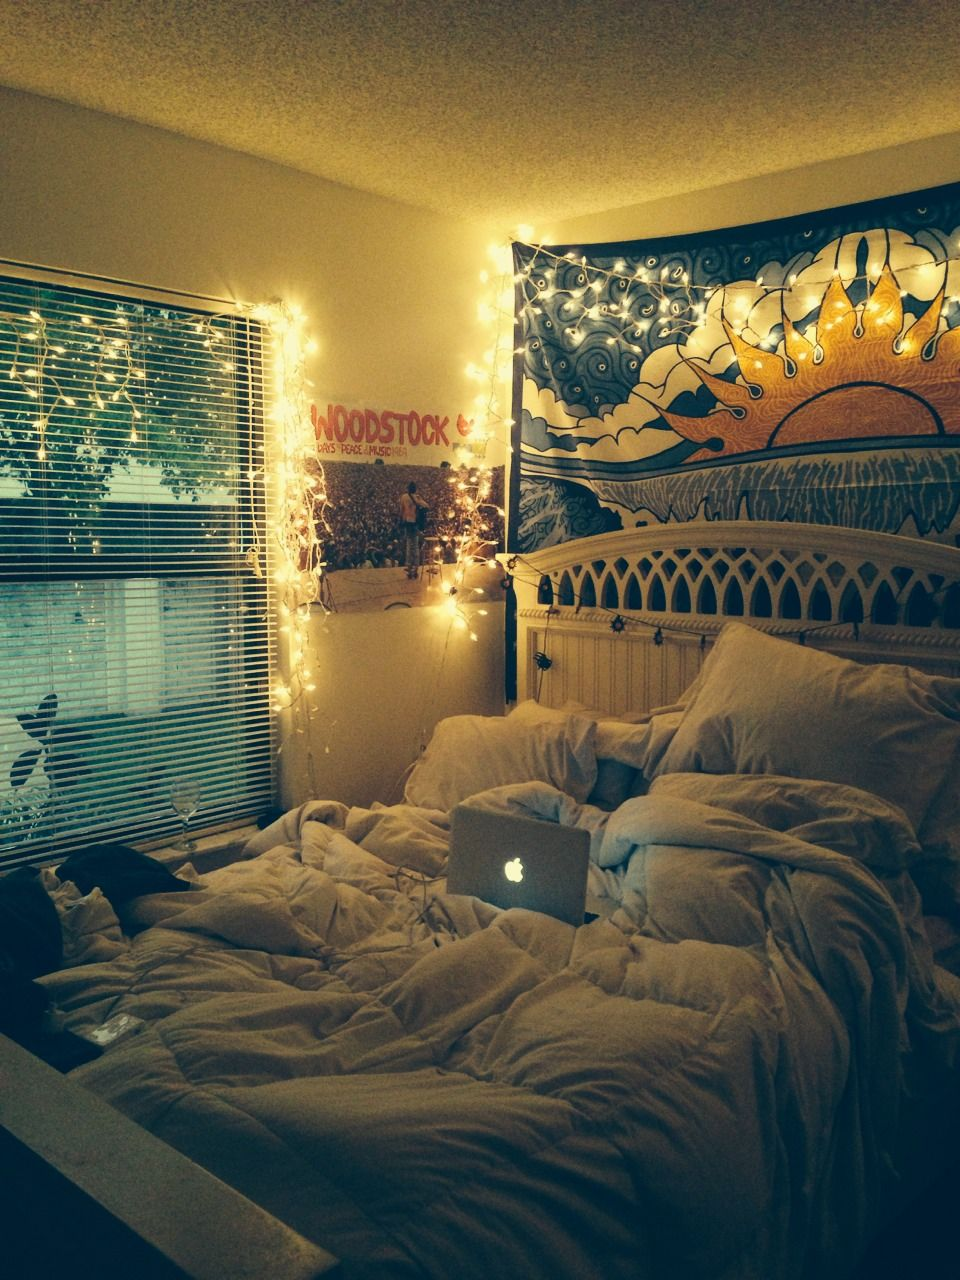 this room looks so cozy   ∂яєαм вє∂яσσмѕ ☮☯   pinterest